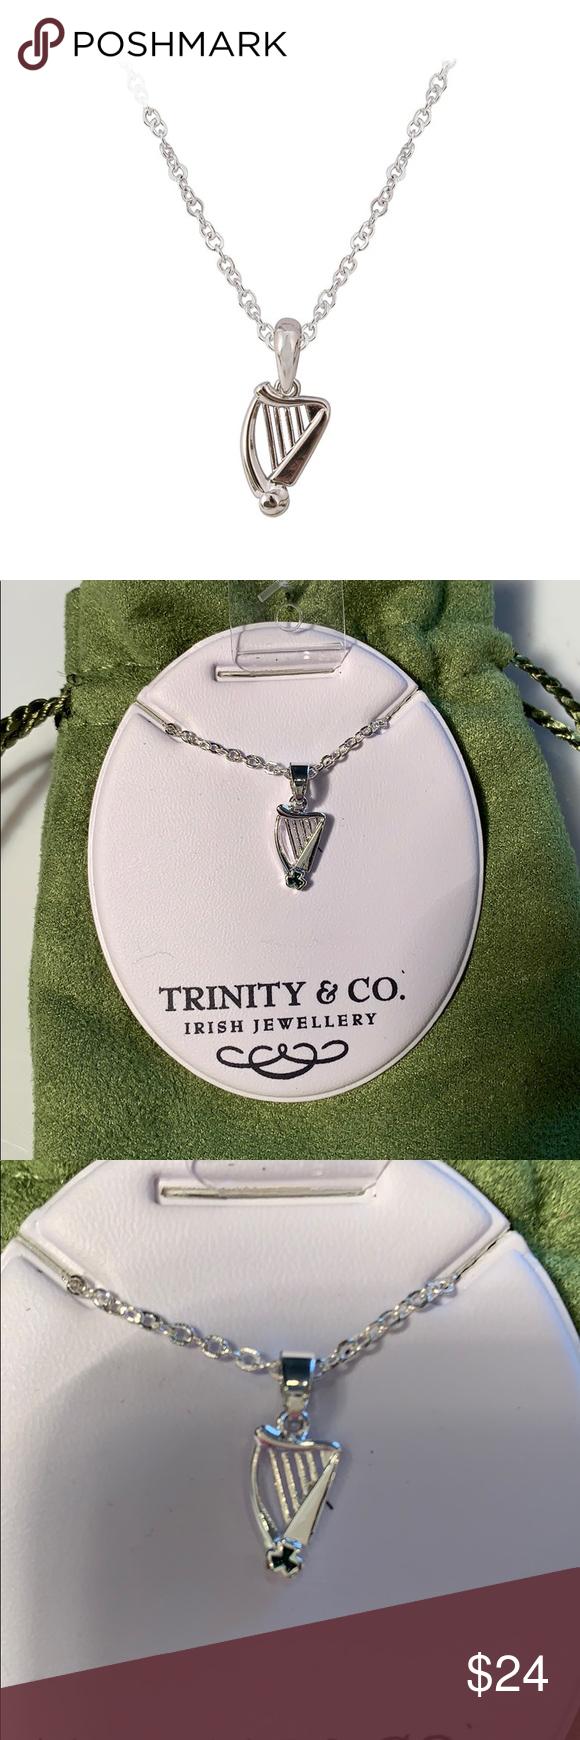 23++ Trinity and co irish jewelry info